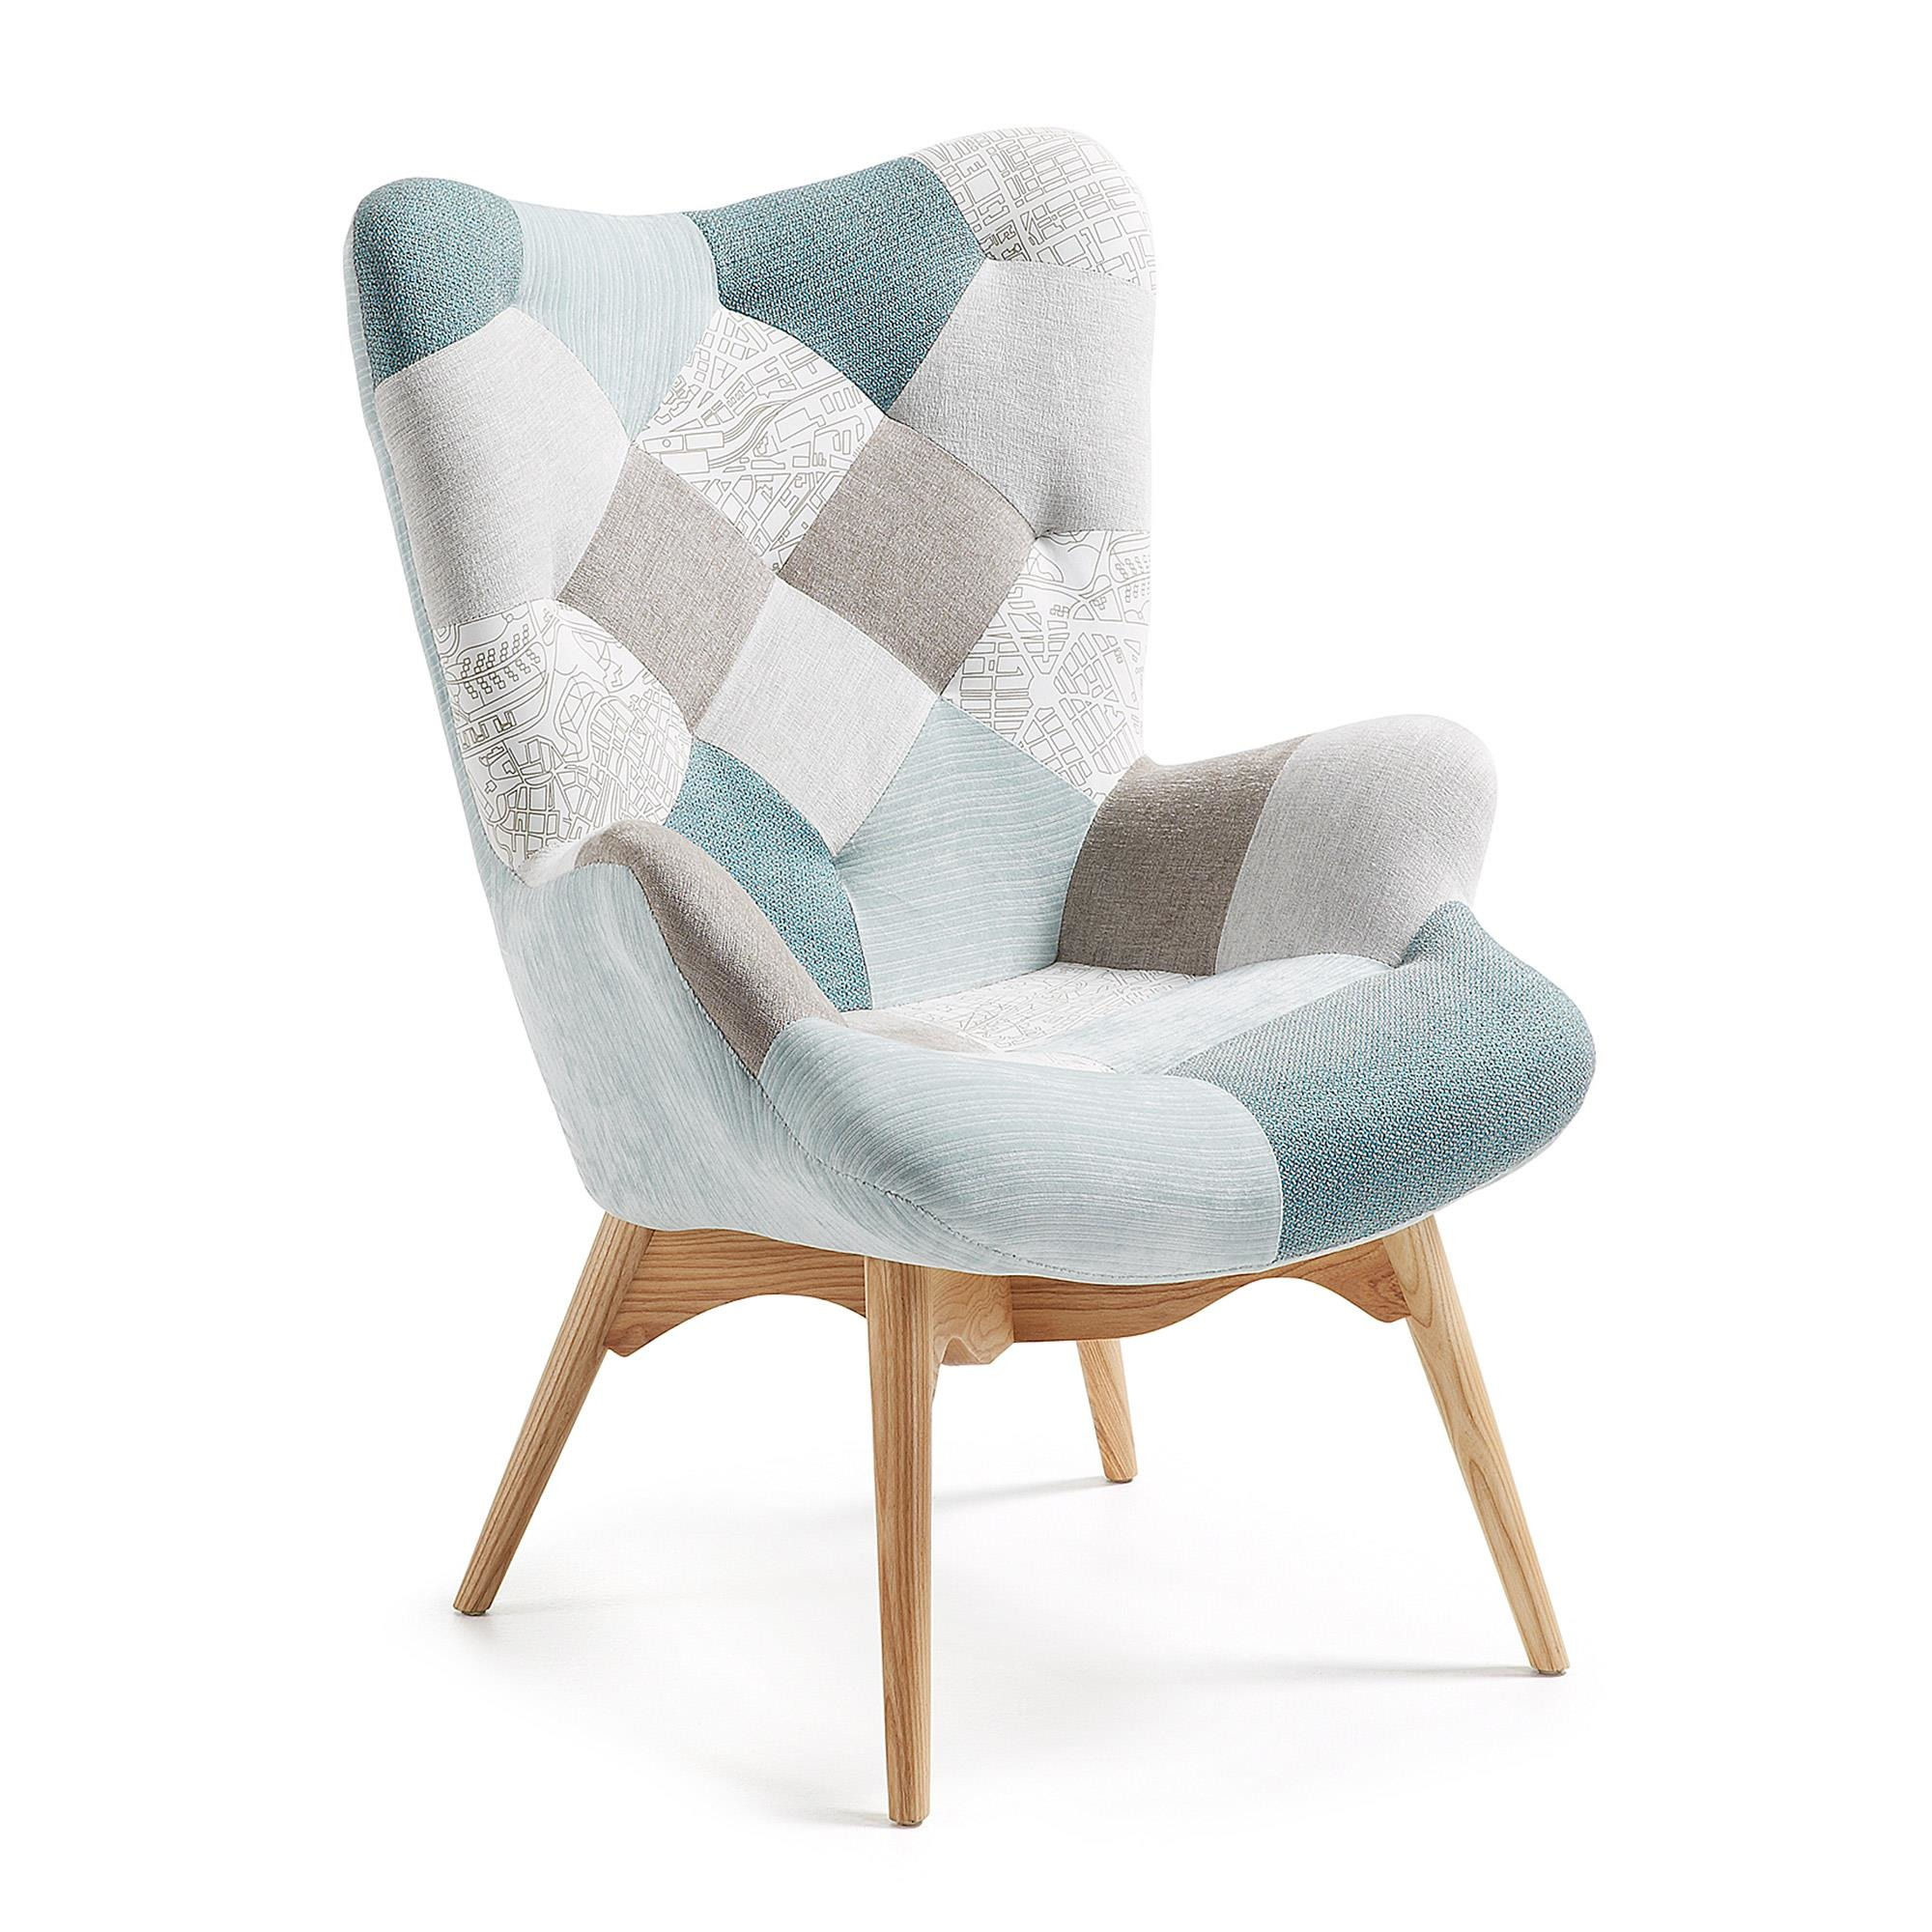 Fotel Knut jasnoniebieski patchwork